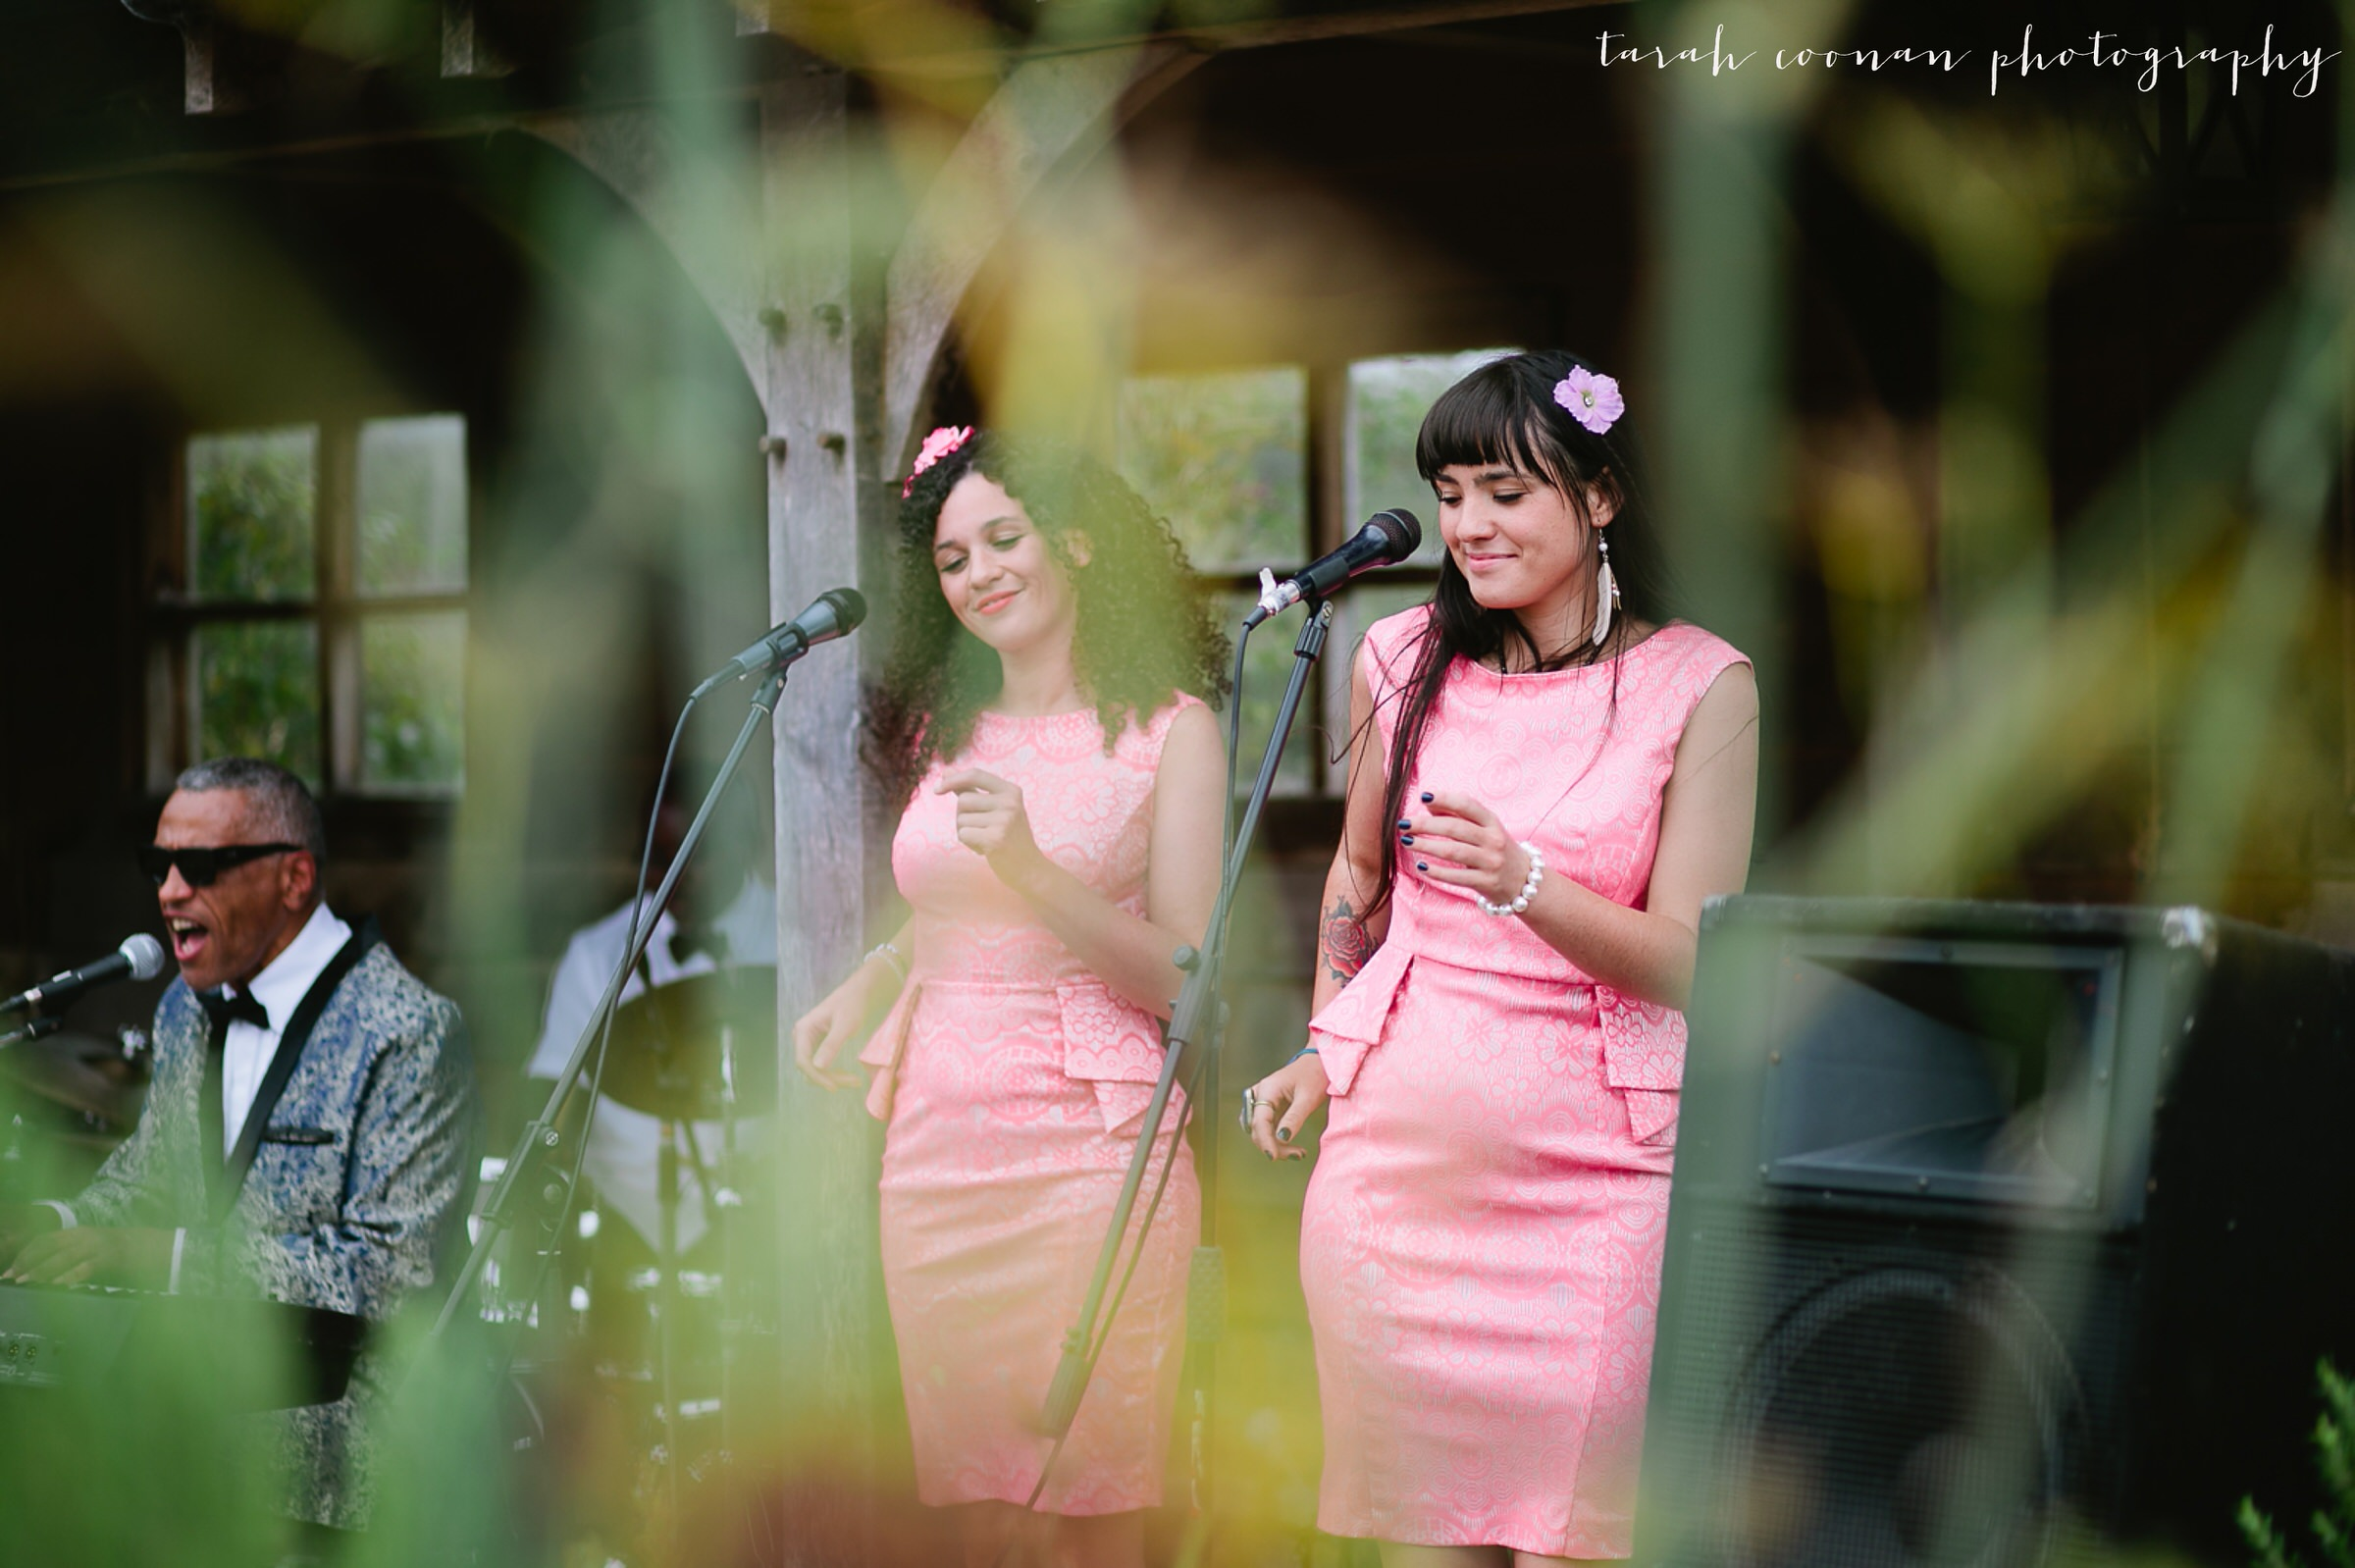 brighton-wedding-photographer40